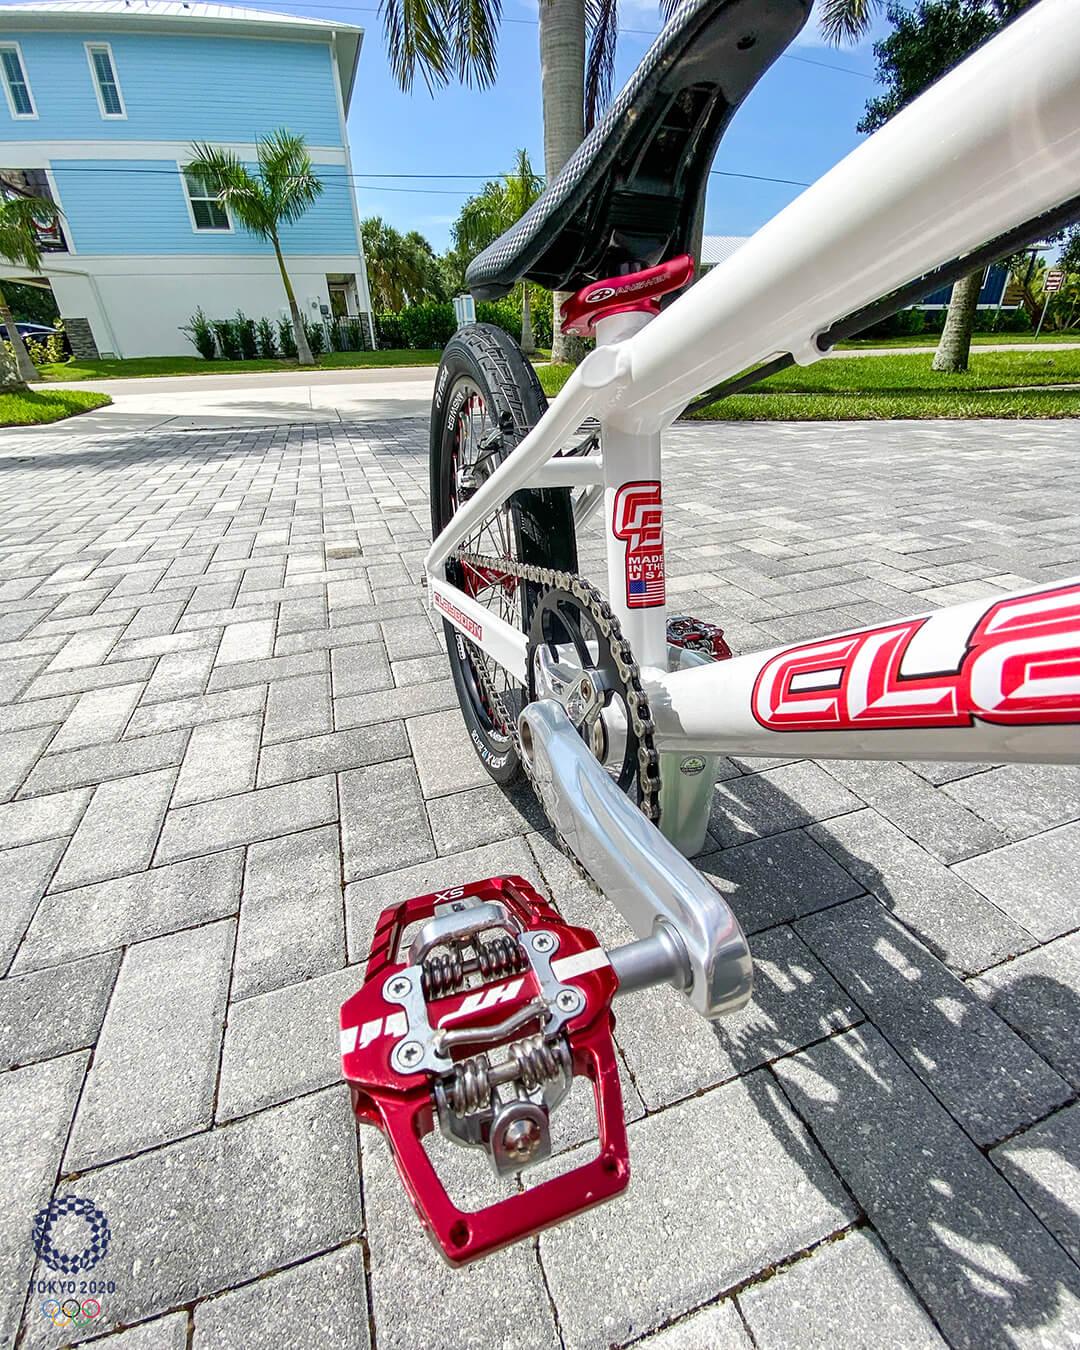 James Palmer Tokyo 2020 Olympic Bike